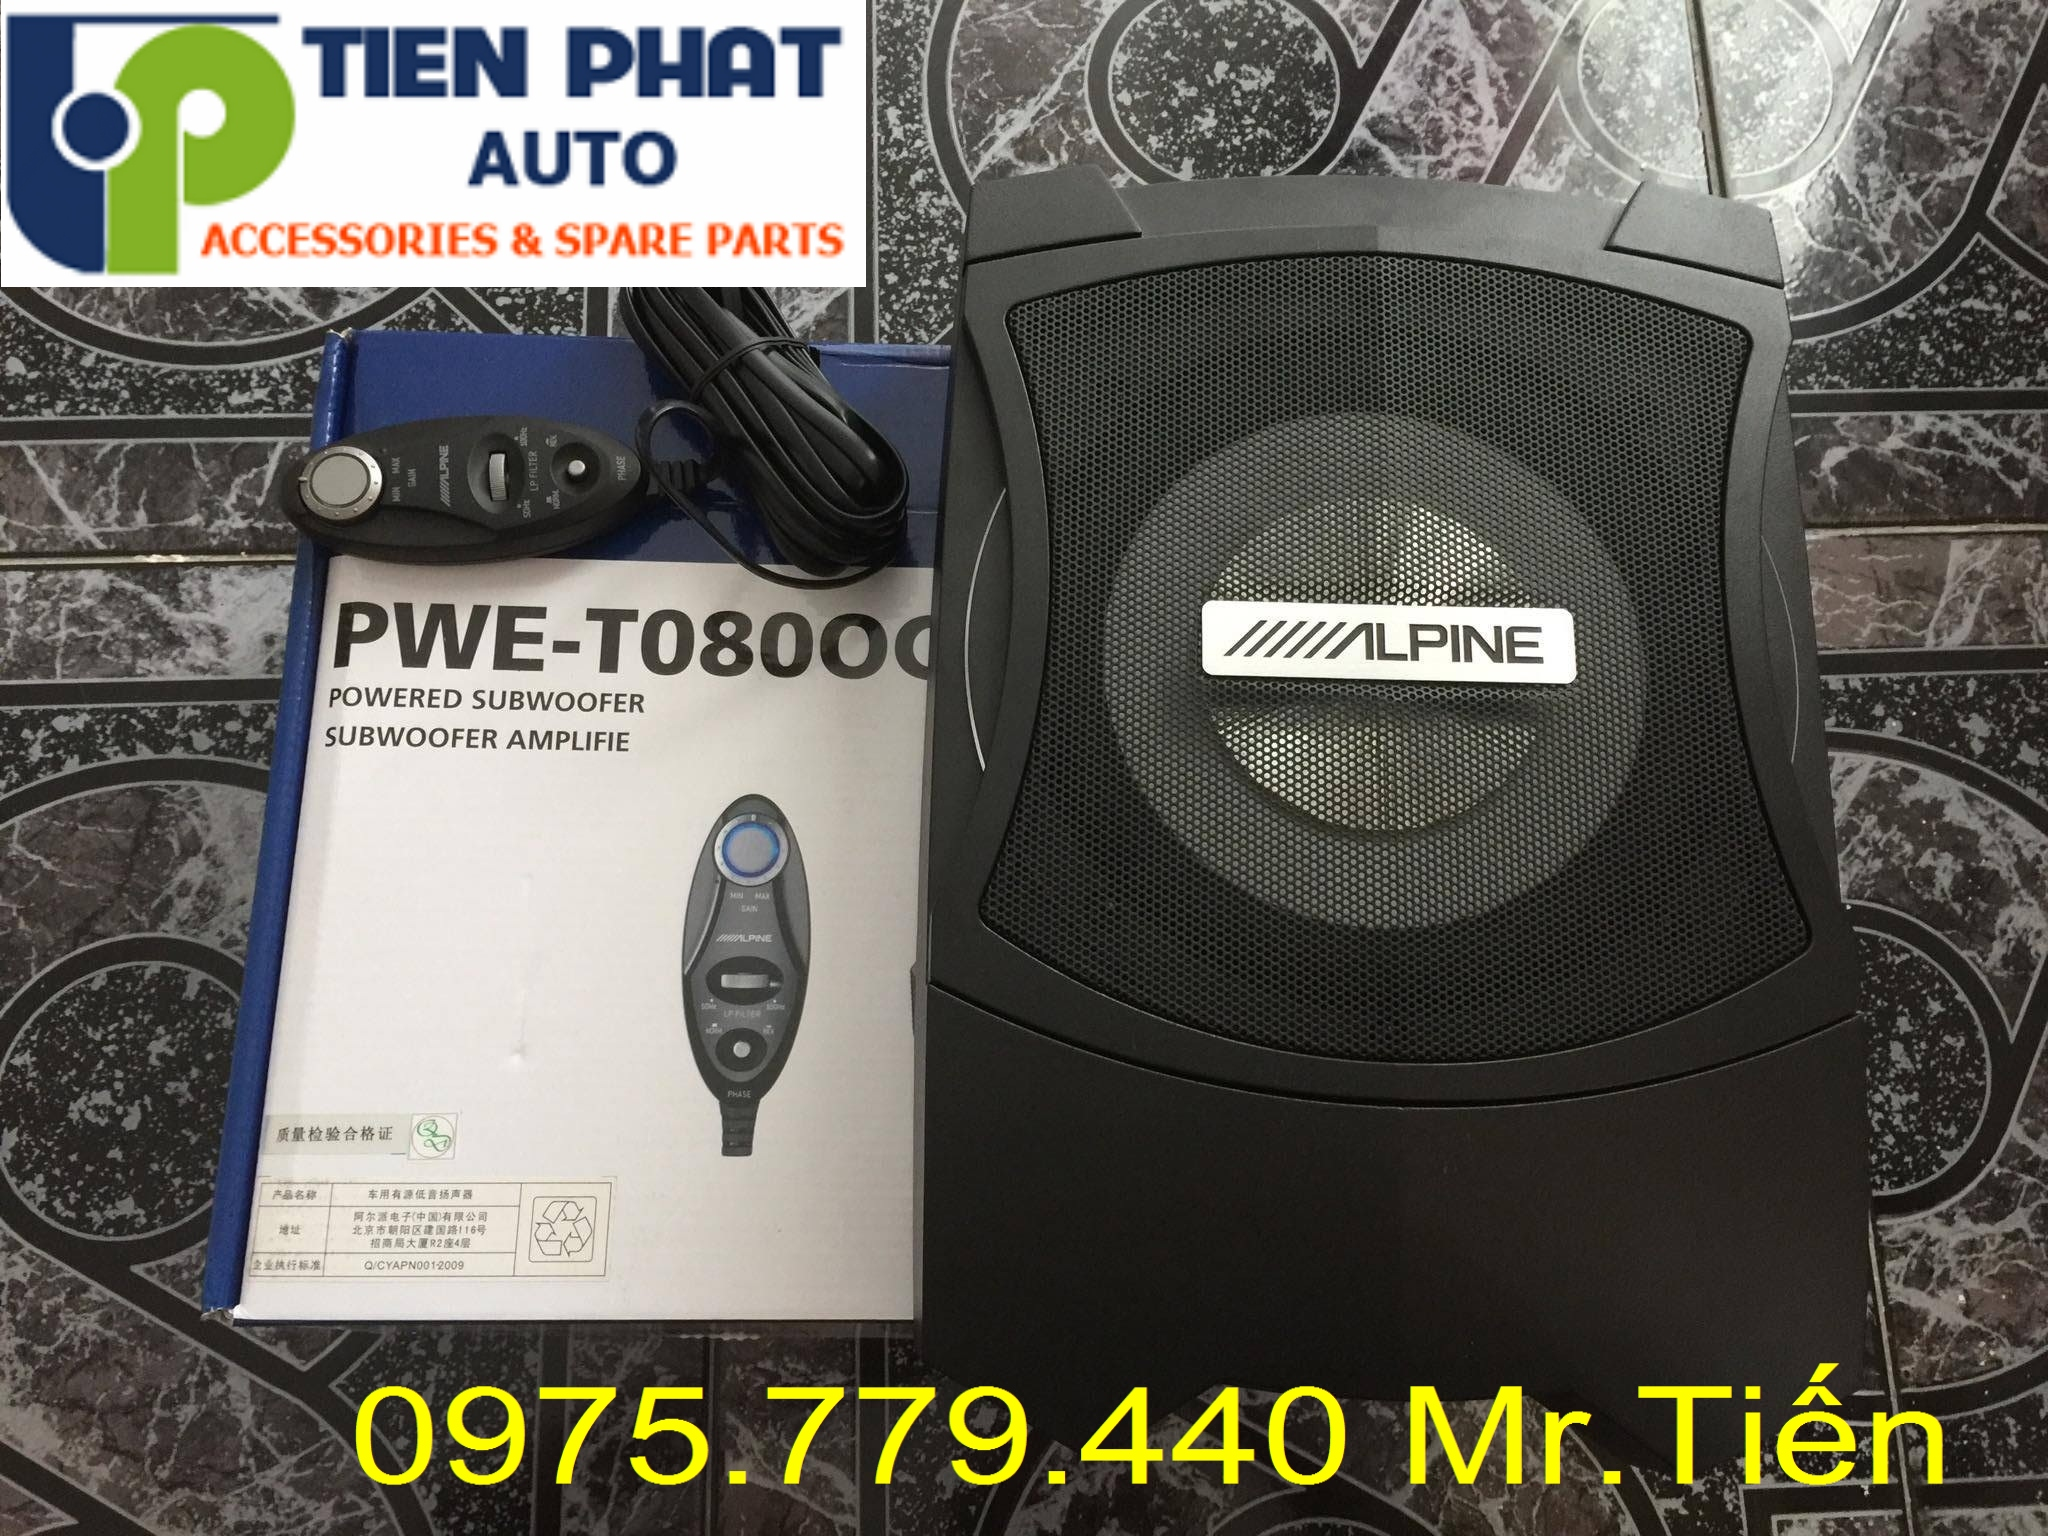 Lắp Loa sub Alpine PWE-T0800C cho Suzuki Ertiga Lắp Đặt Tận Nơi